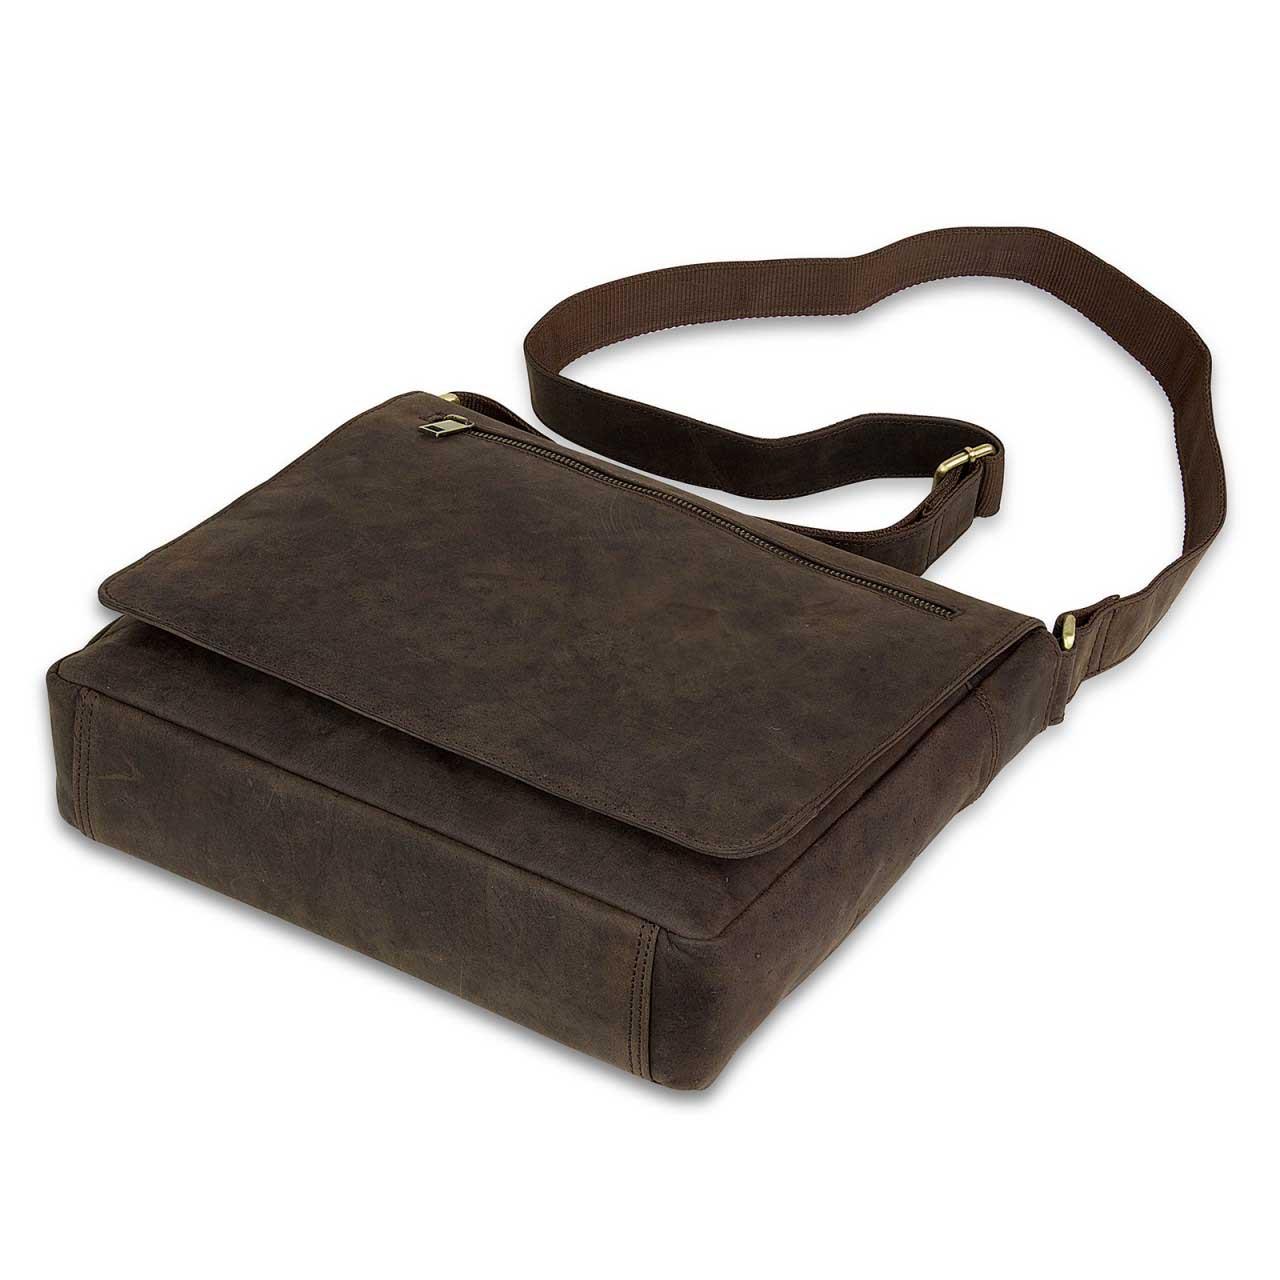 STILORD Leder Messenger Bag kompakt Vintage Schulter Umhängetasche 12.2 Zoll Tablets MacBook Tasche echtes Leder dunkelbraun - Bild 4